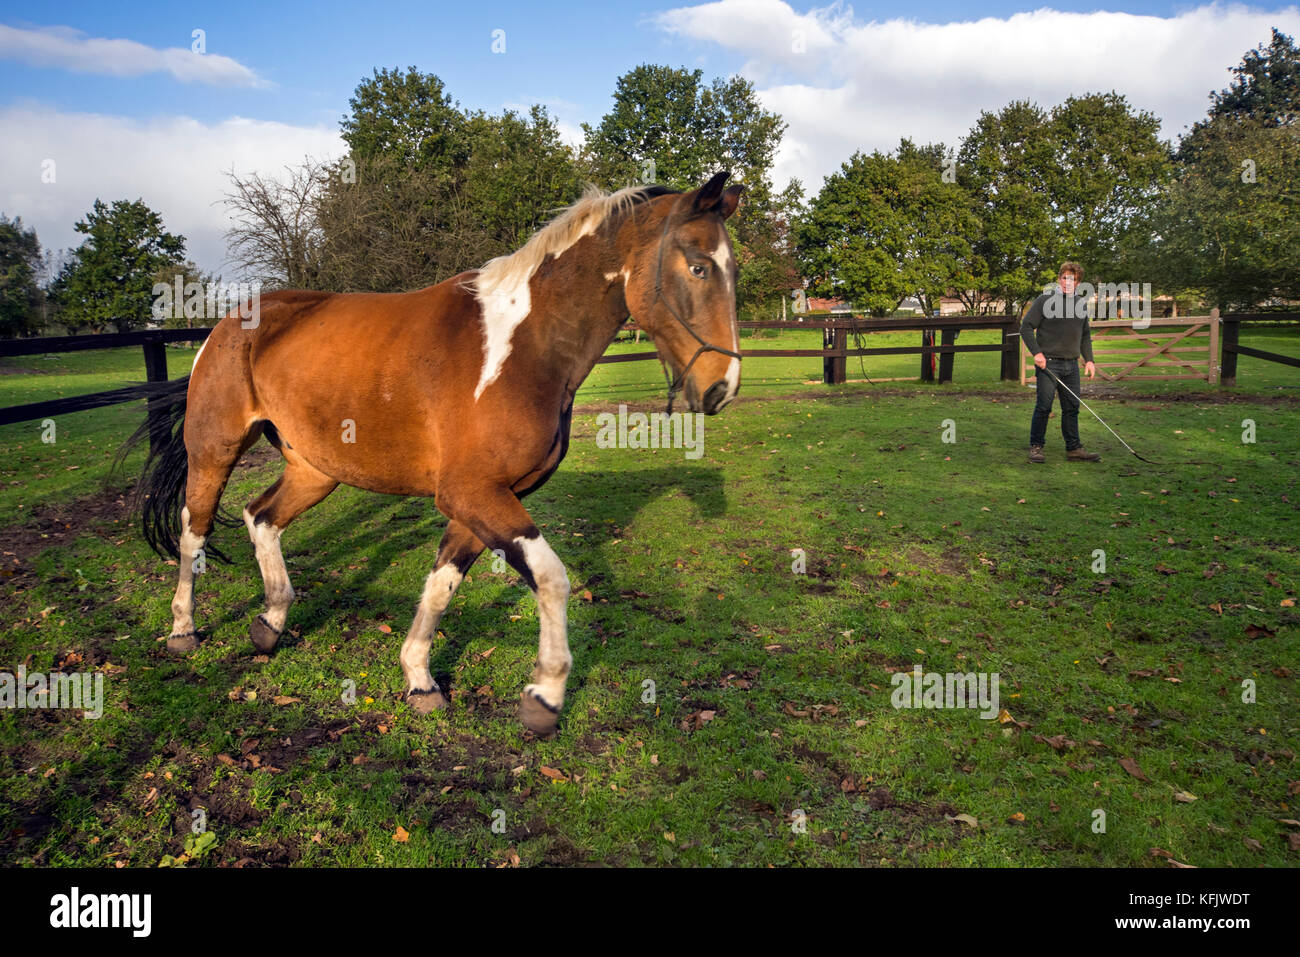 Horse trainer training Pinto horse / Quarter Horse stallion trotting outside within wooden enclosure - Stock Image